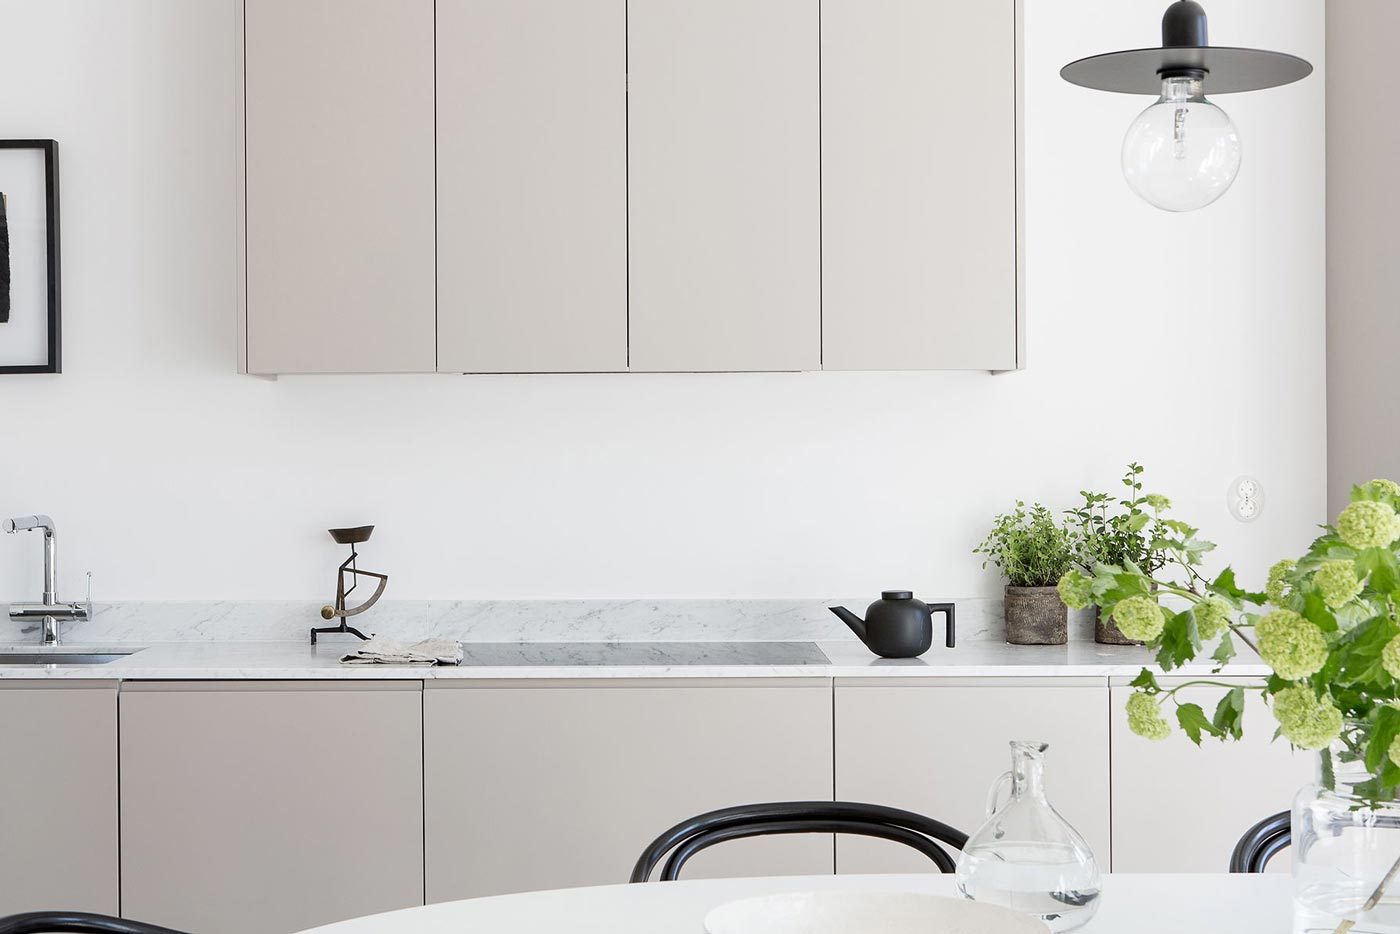 Cucina grigia moderna: una valida alternativa alla cucina nera